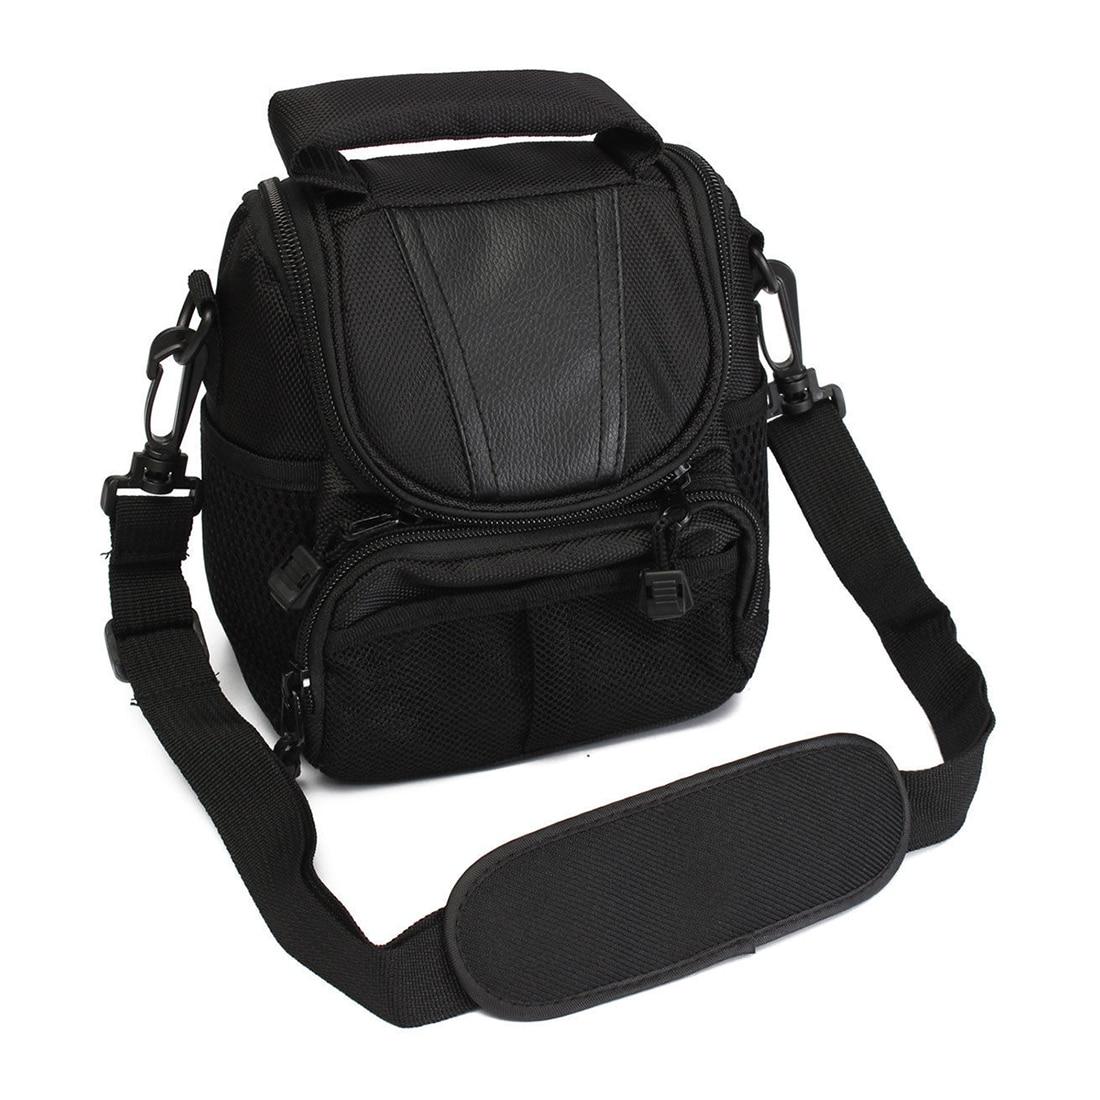 Small Nylon Waterproof Camera Shoulder Bag Case Handbag For Nikon Canon SLR DSLR